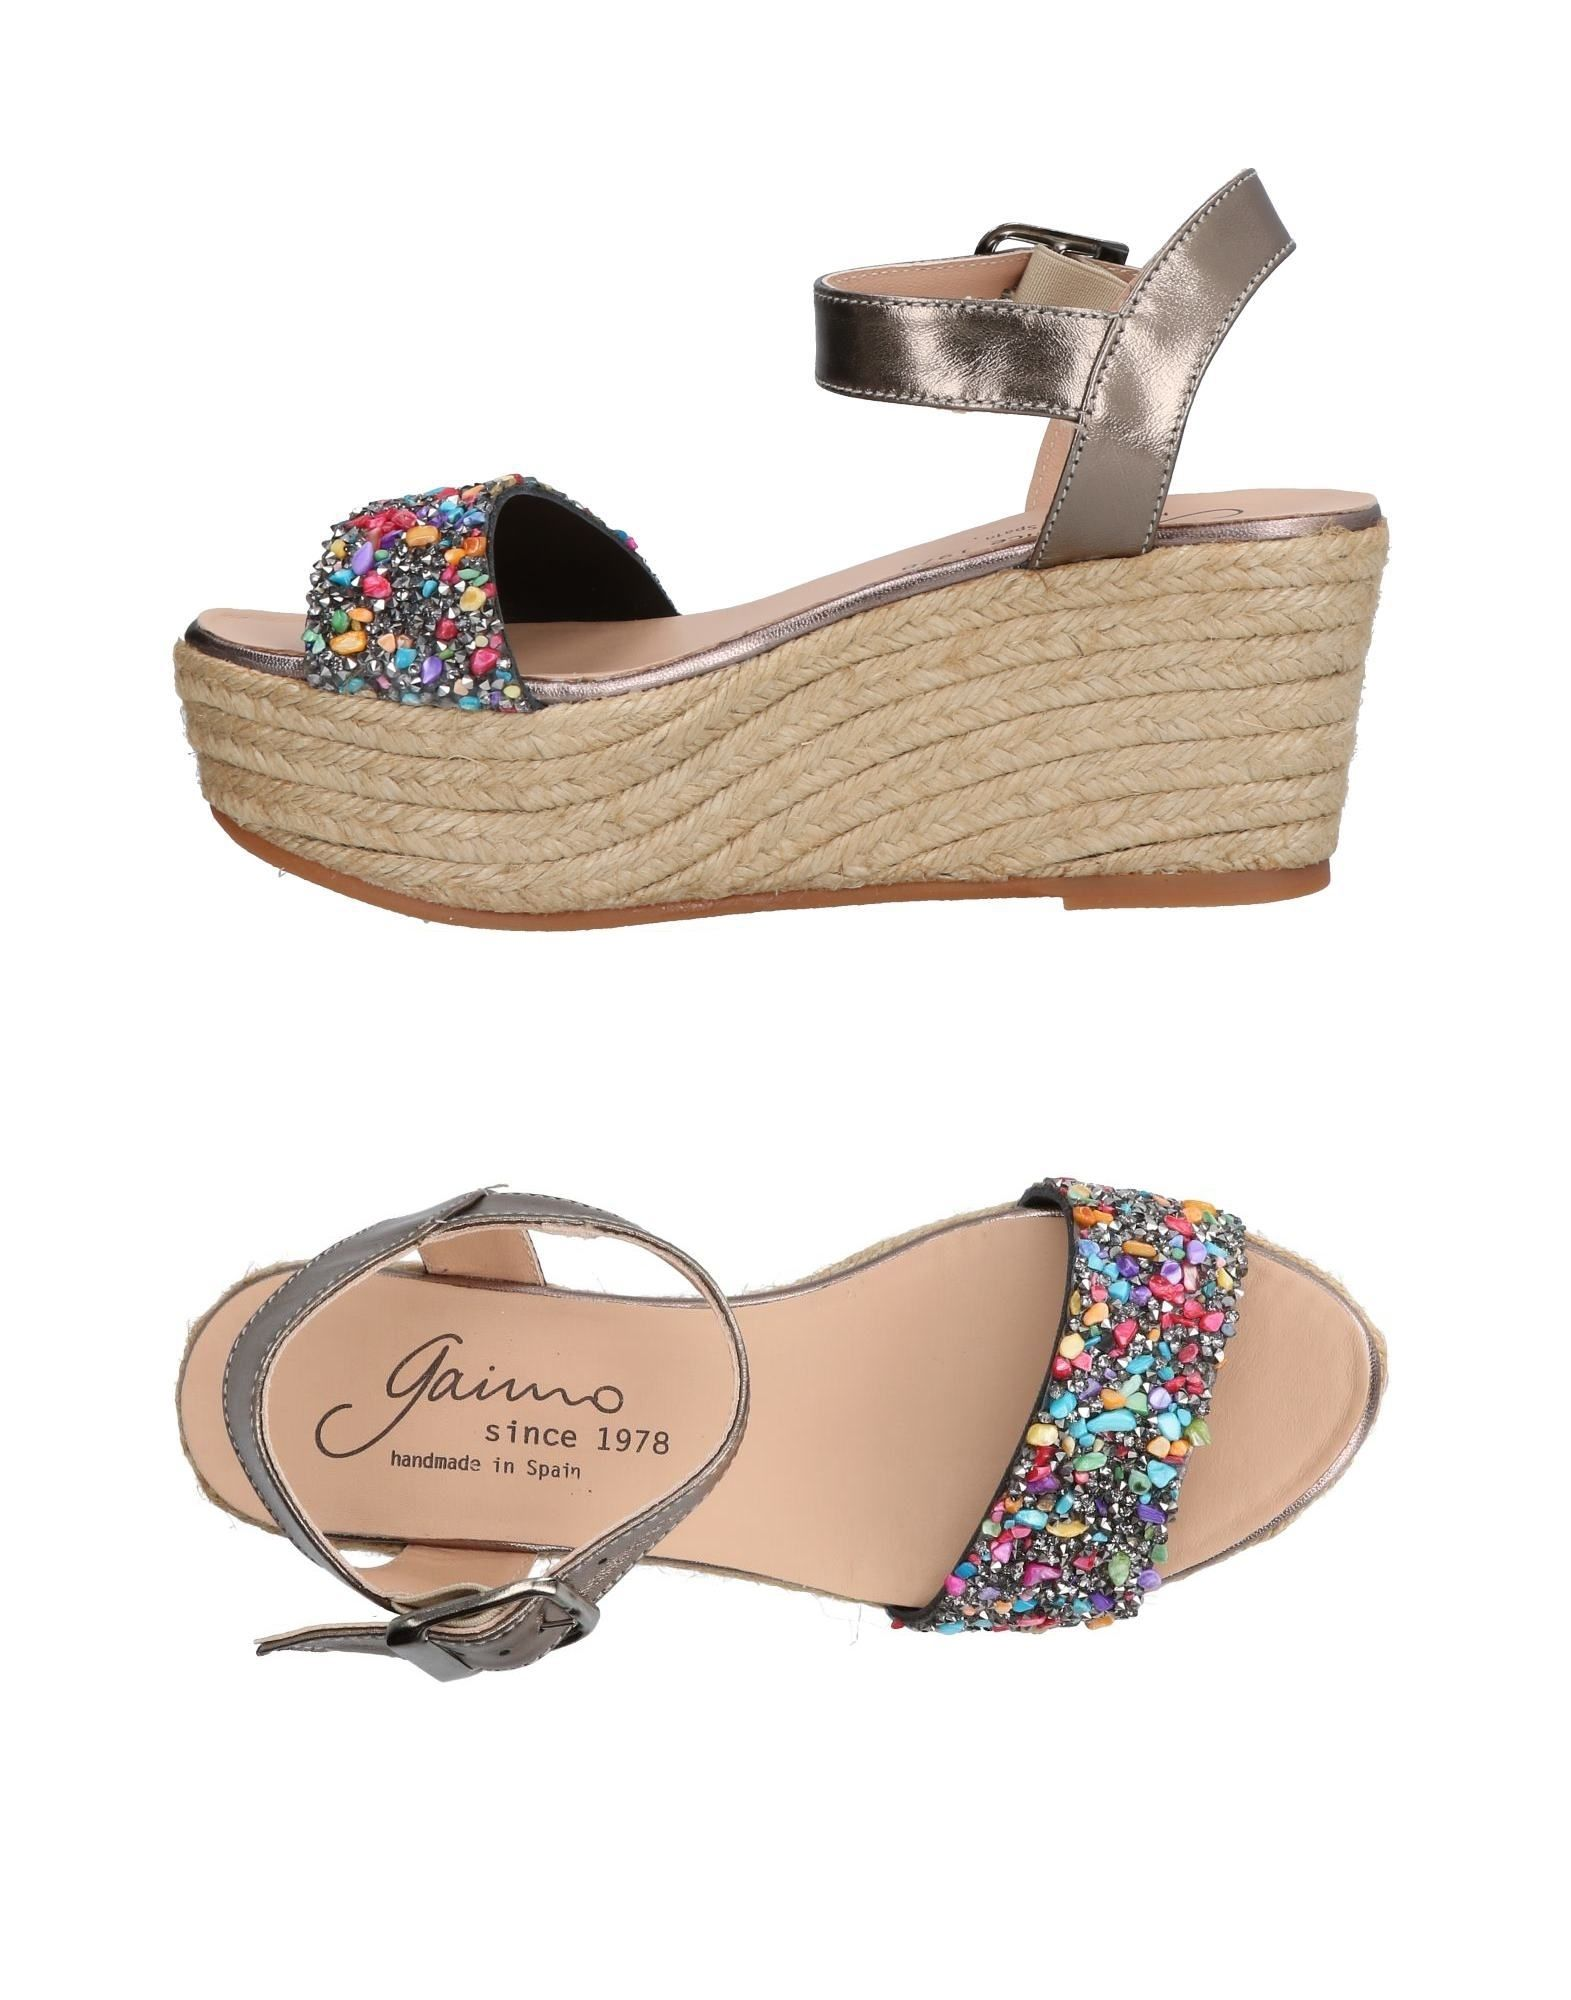 Gaimo Sandalen Damen  11447235OJ Gute Qualität beliebte Schuhe